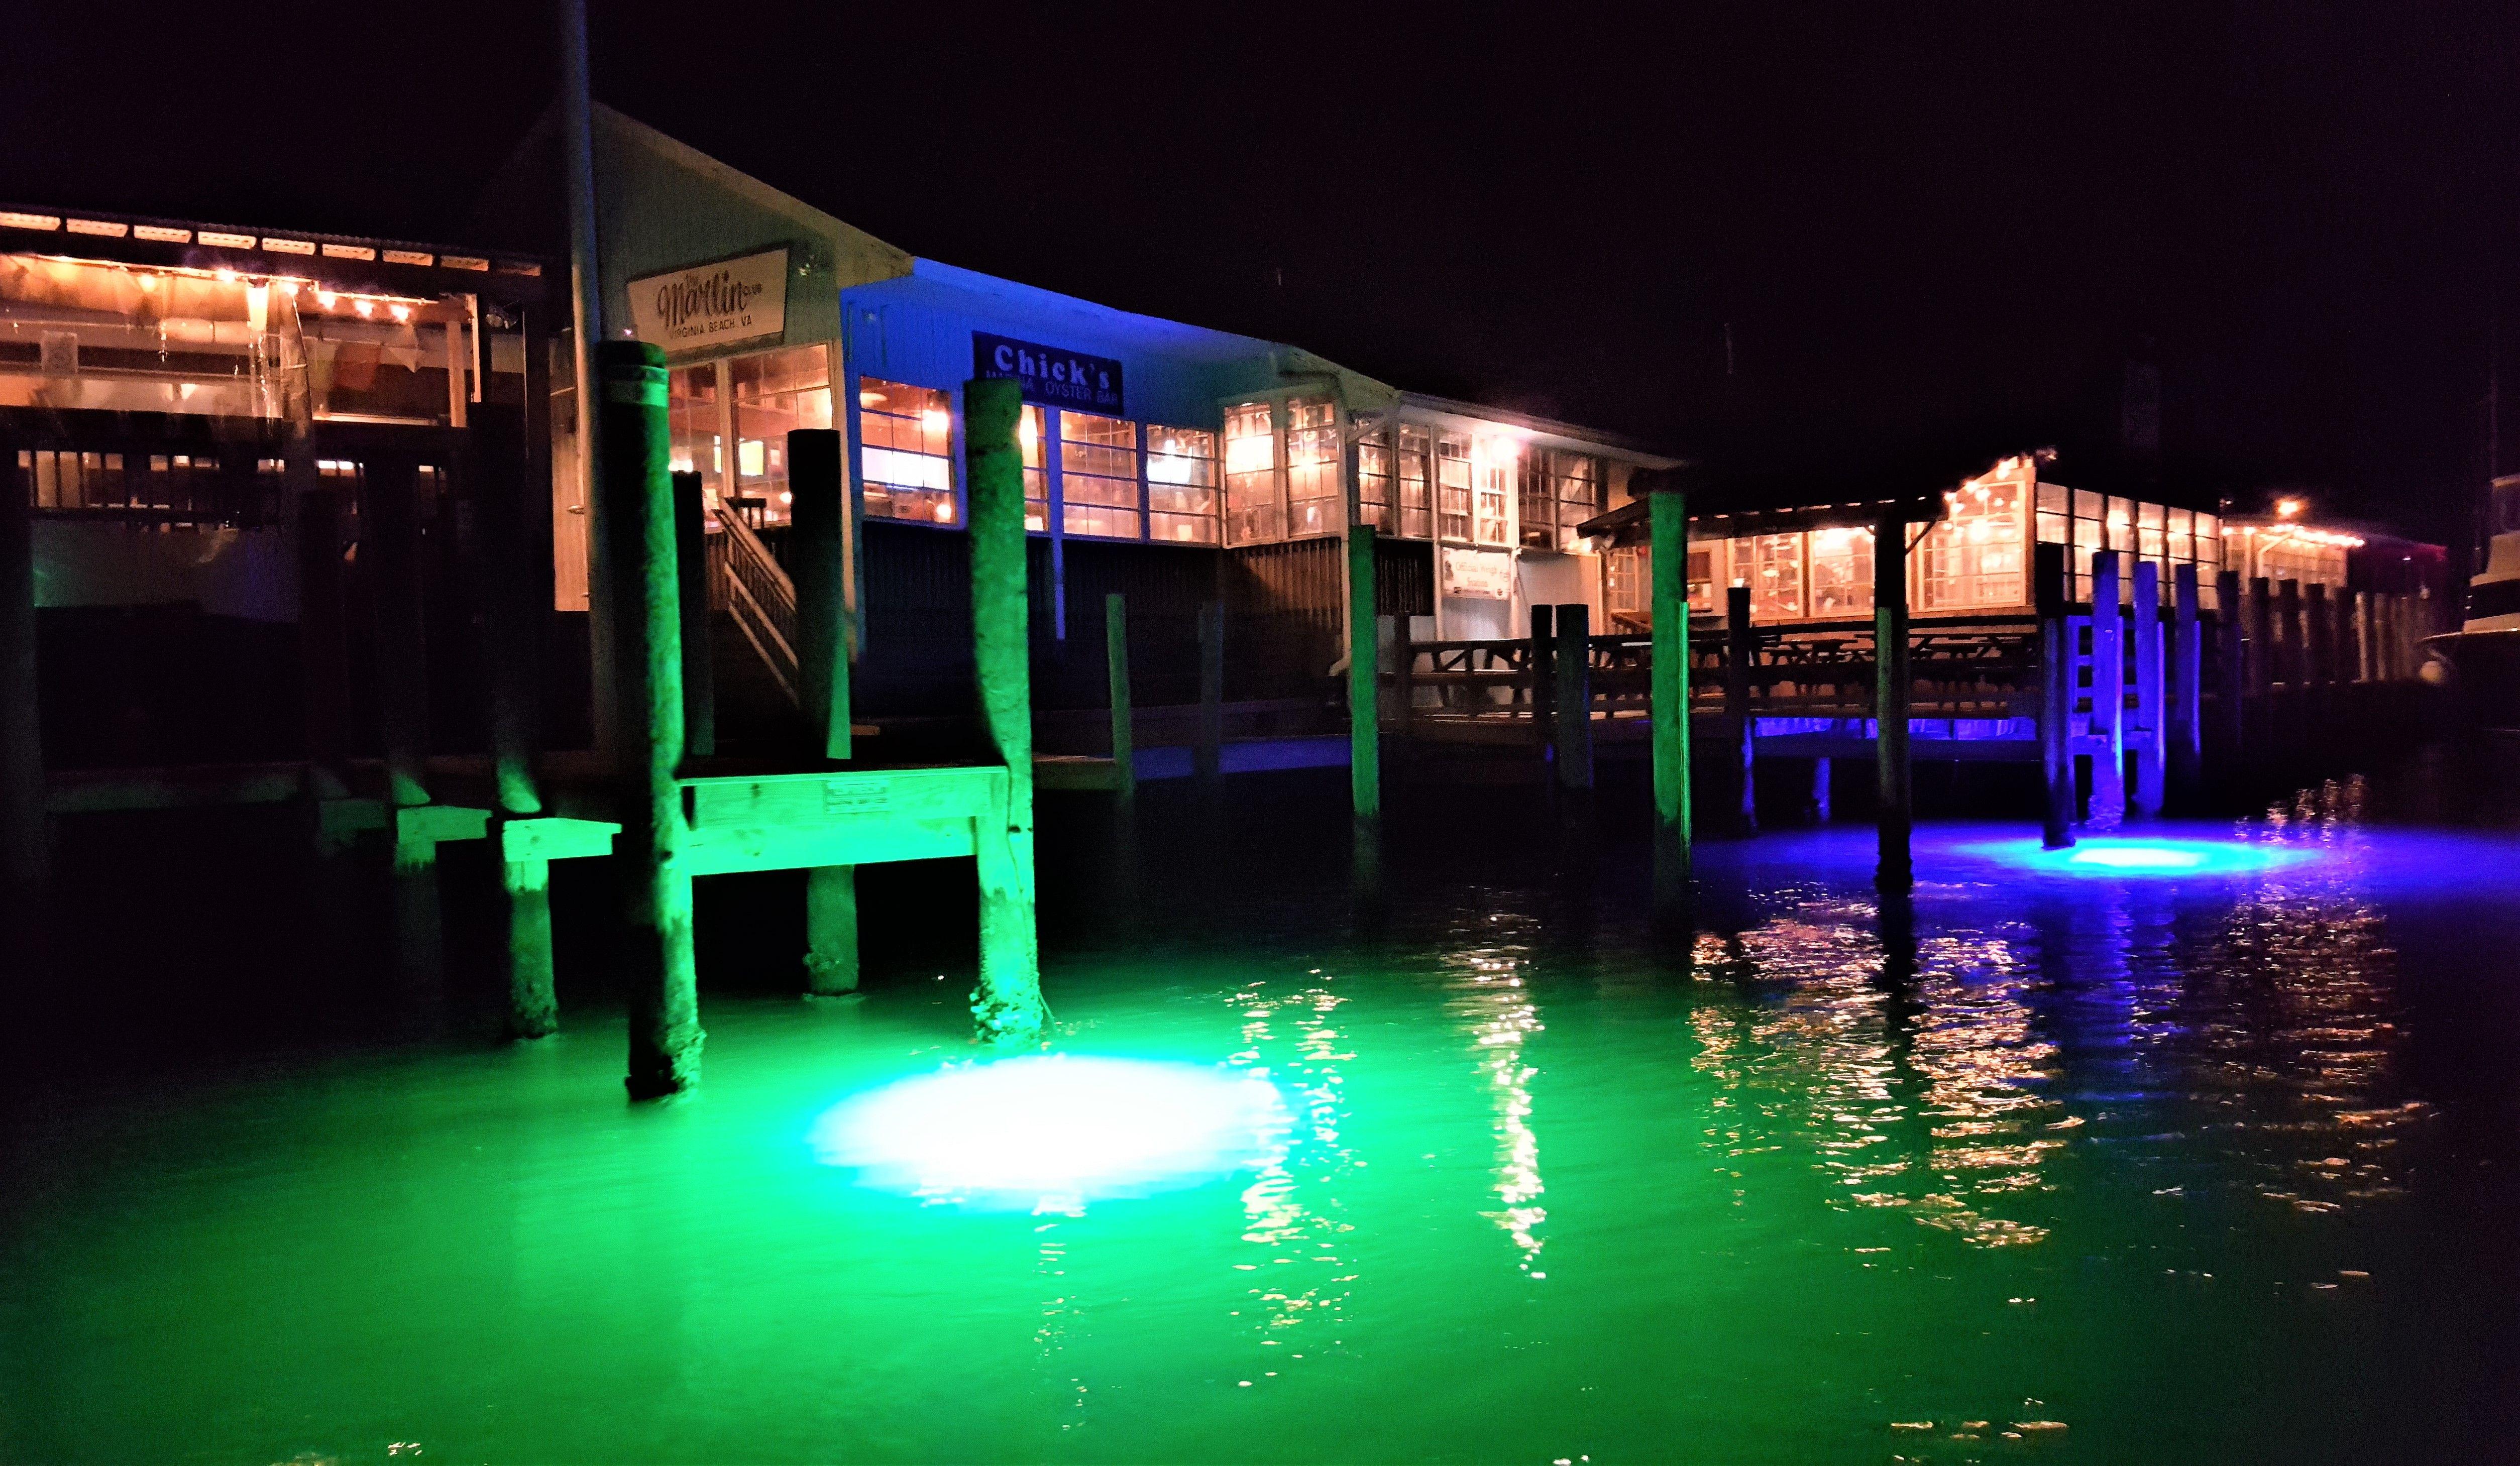 Mega Watt Led Underwater Dock Lights Dock Lighting Underwater Lights Underwater Led Lights